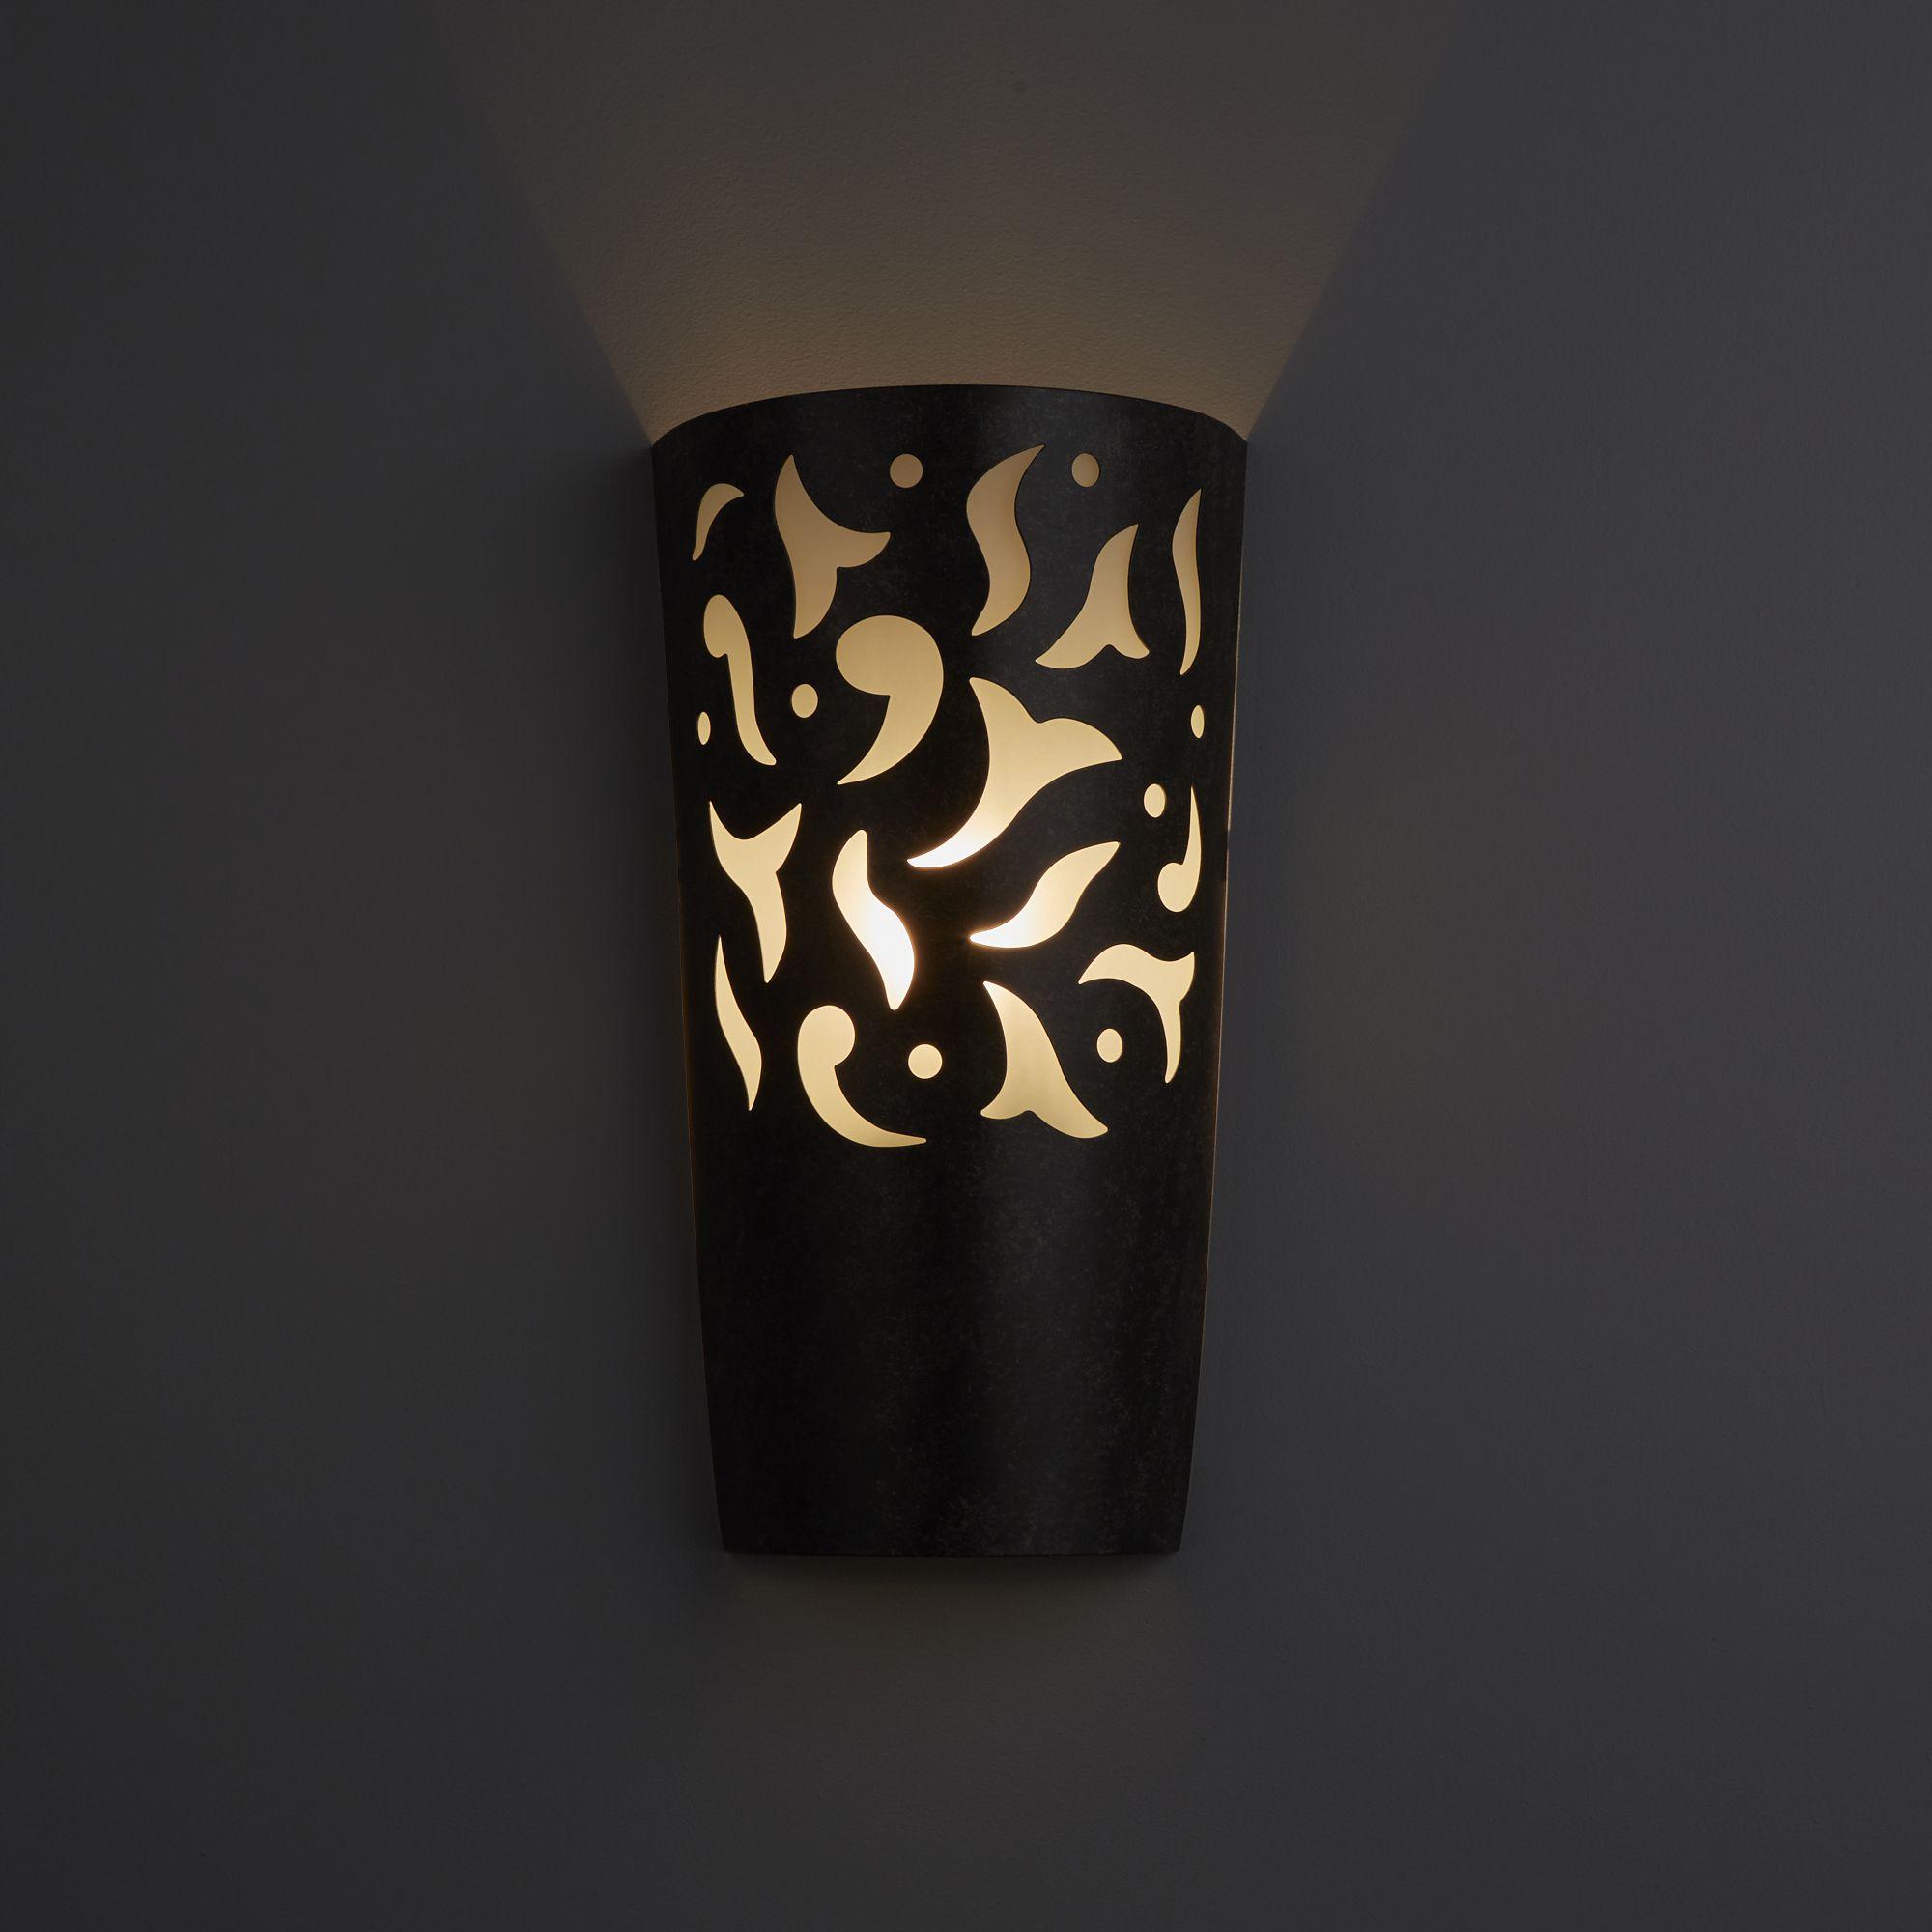 Ankara Contemporary Black Wall Light